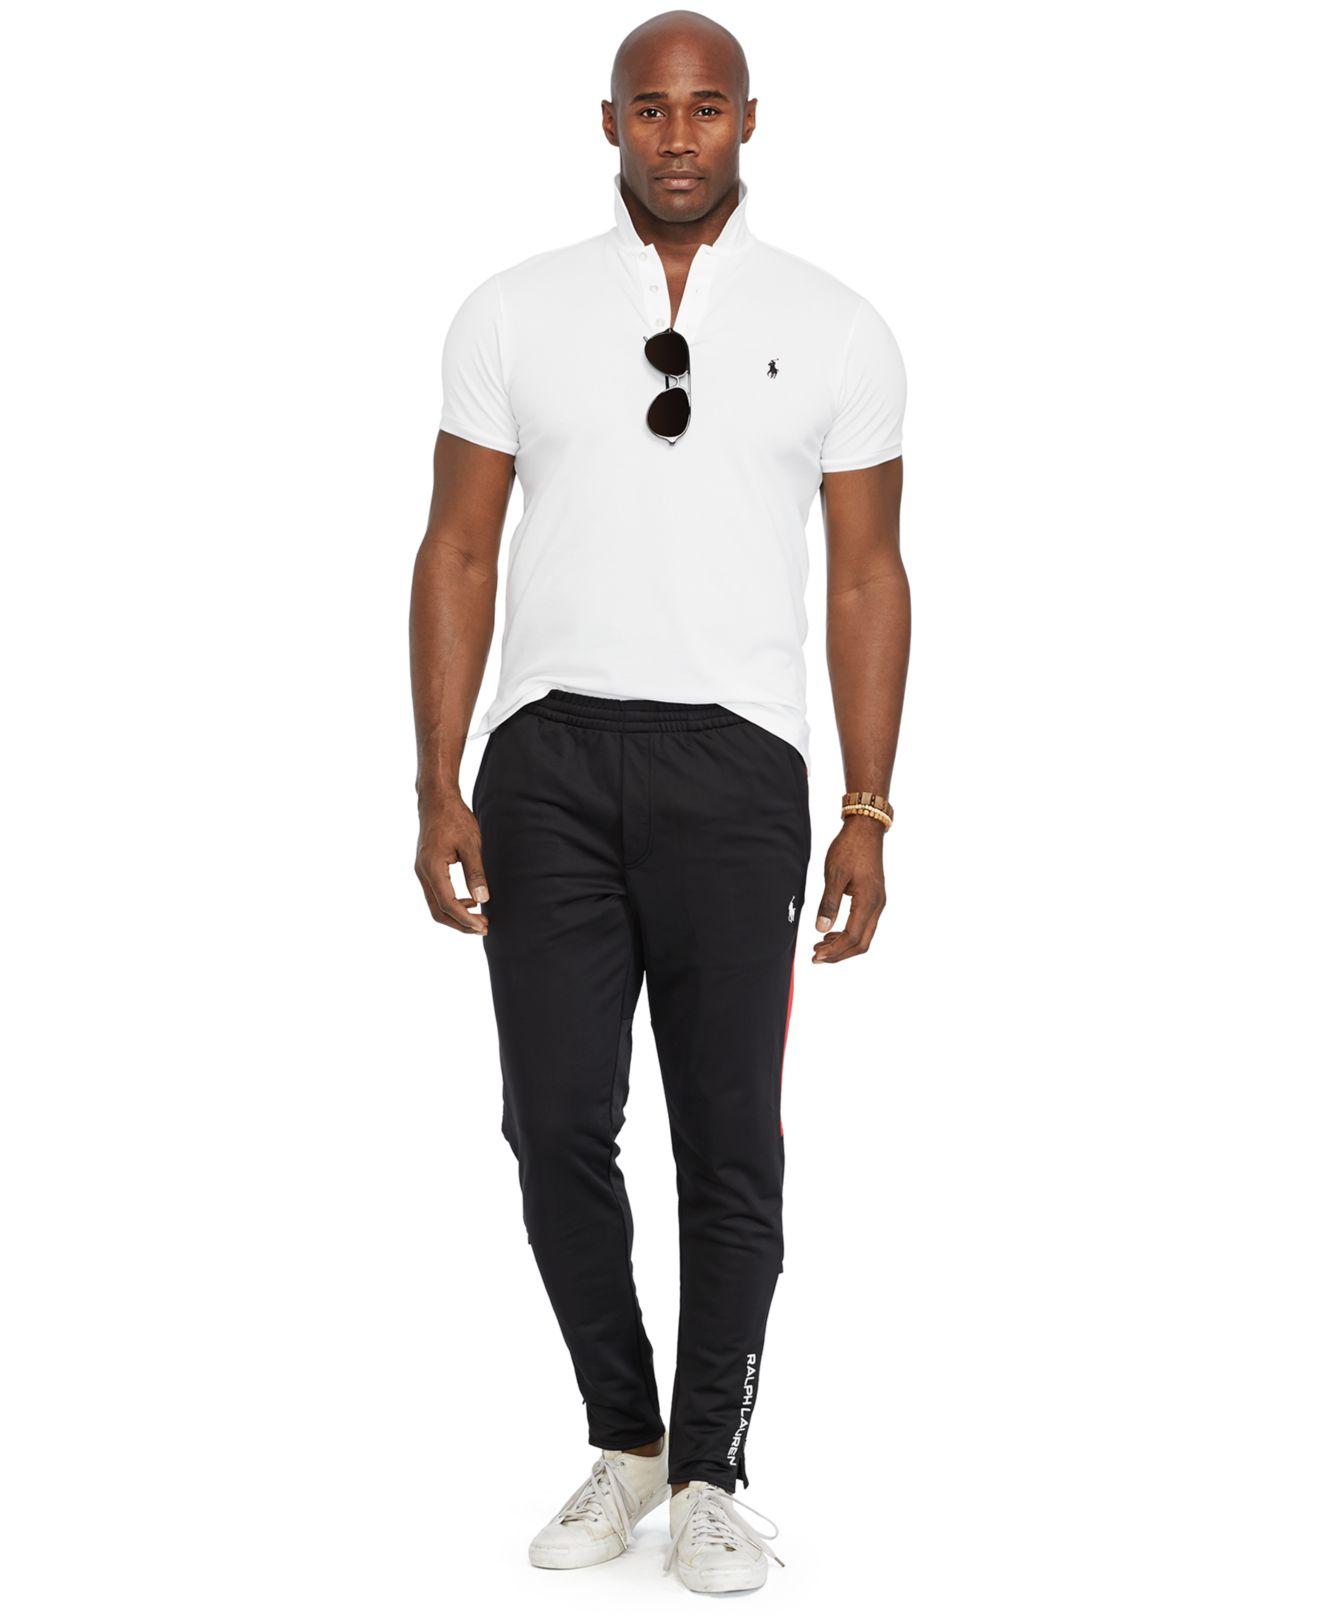 Black co ed tall